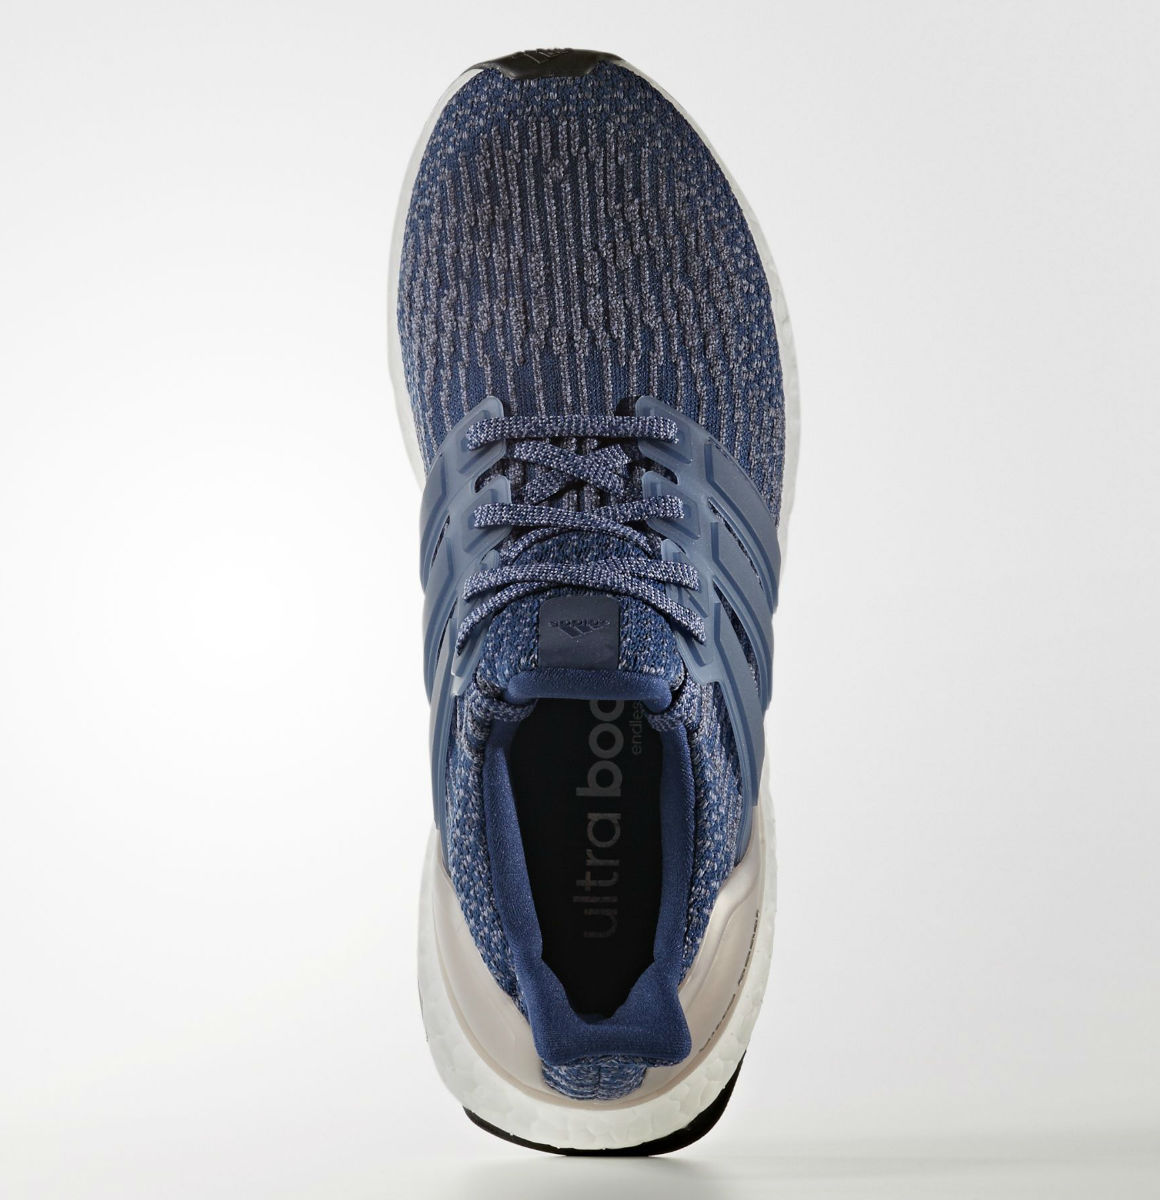 Adidas Ultra Boost Women's Mystery Blue